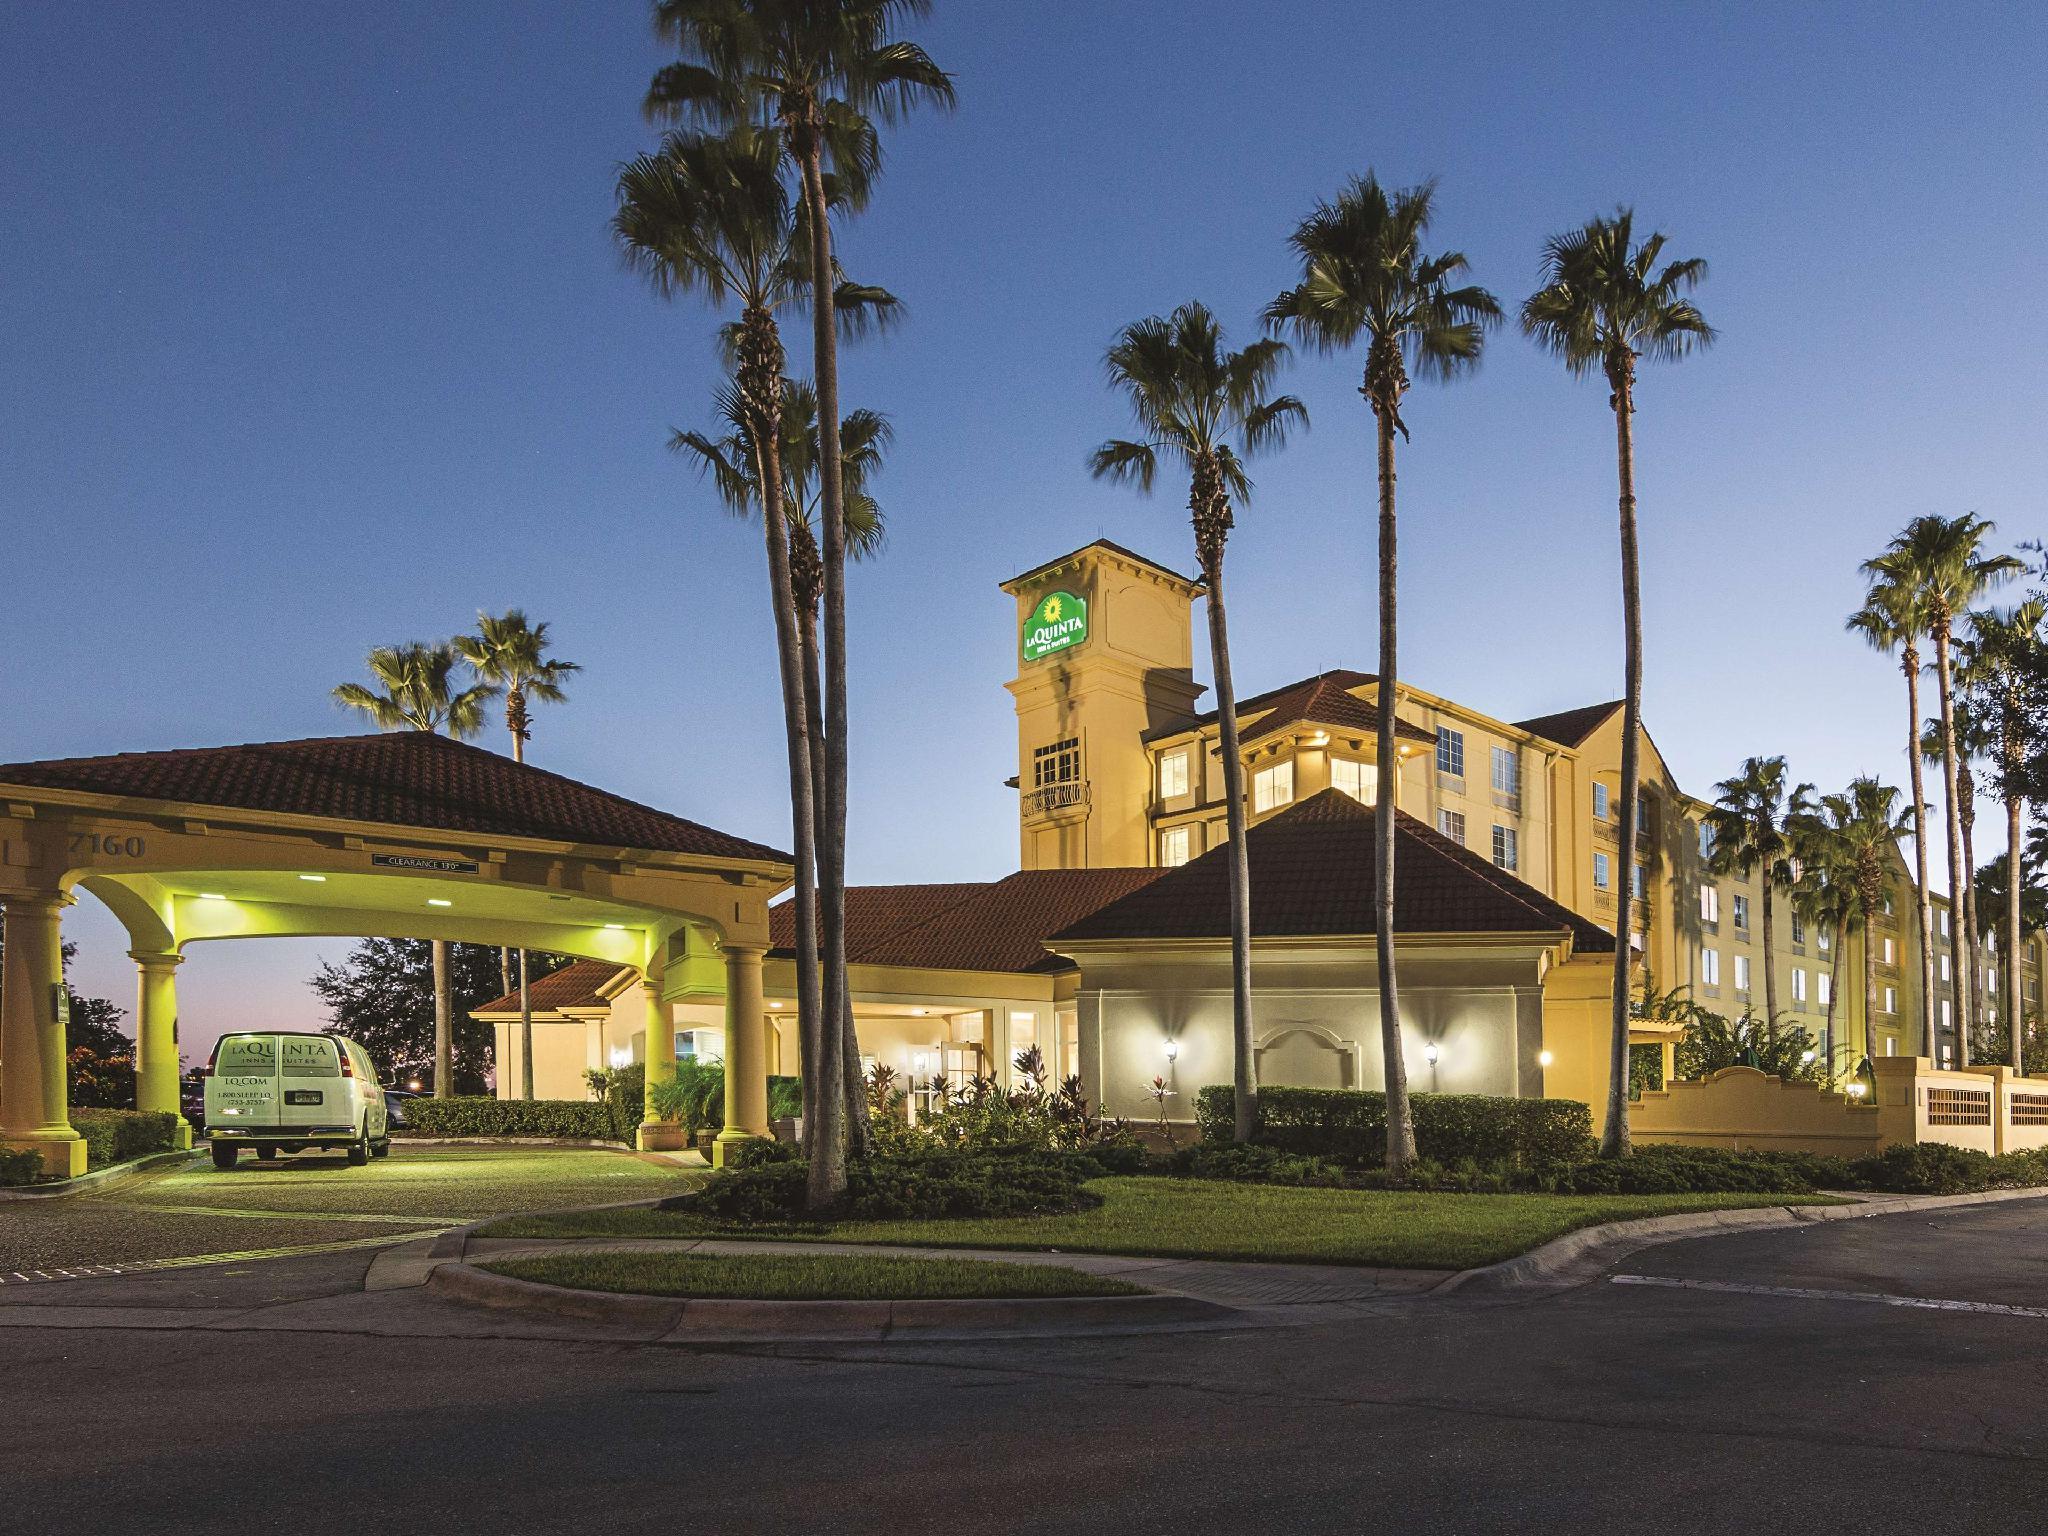 La Quinta Inn And Suites By Wyndham Orlando Airport North